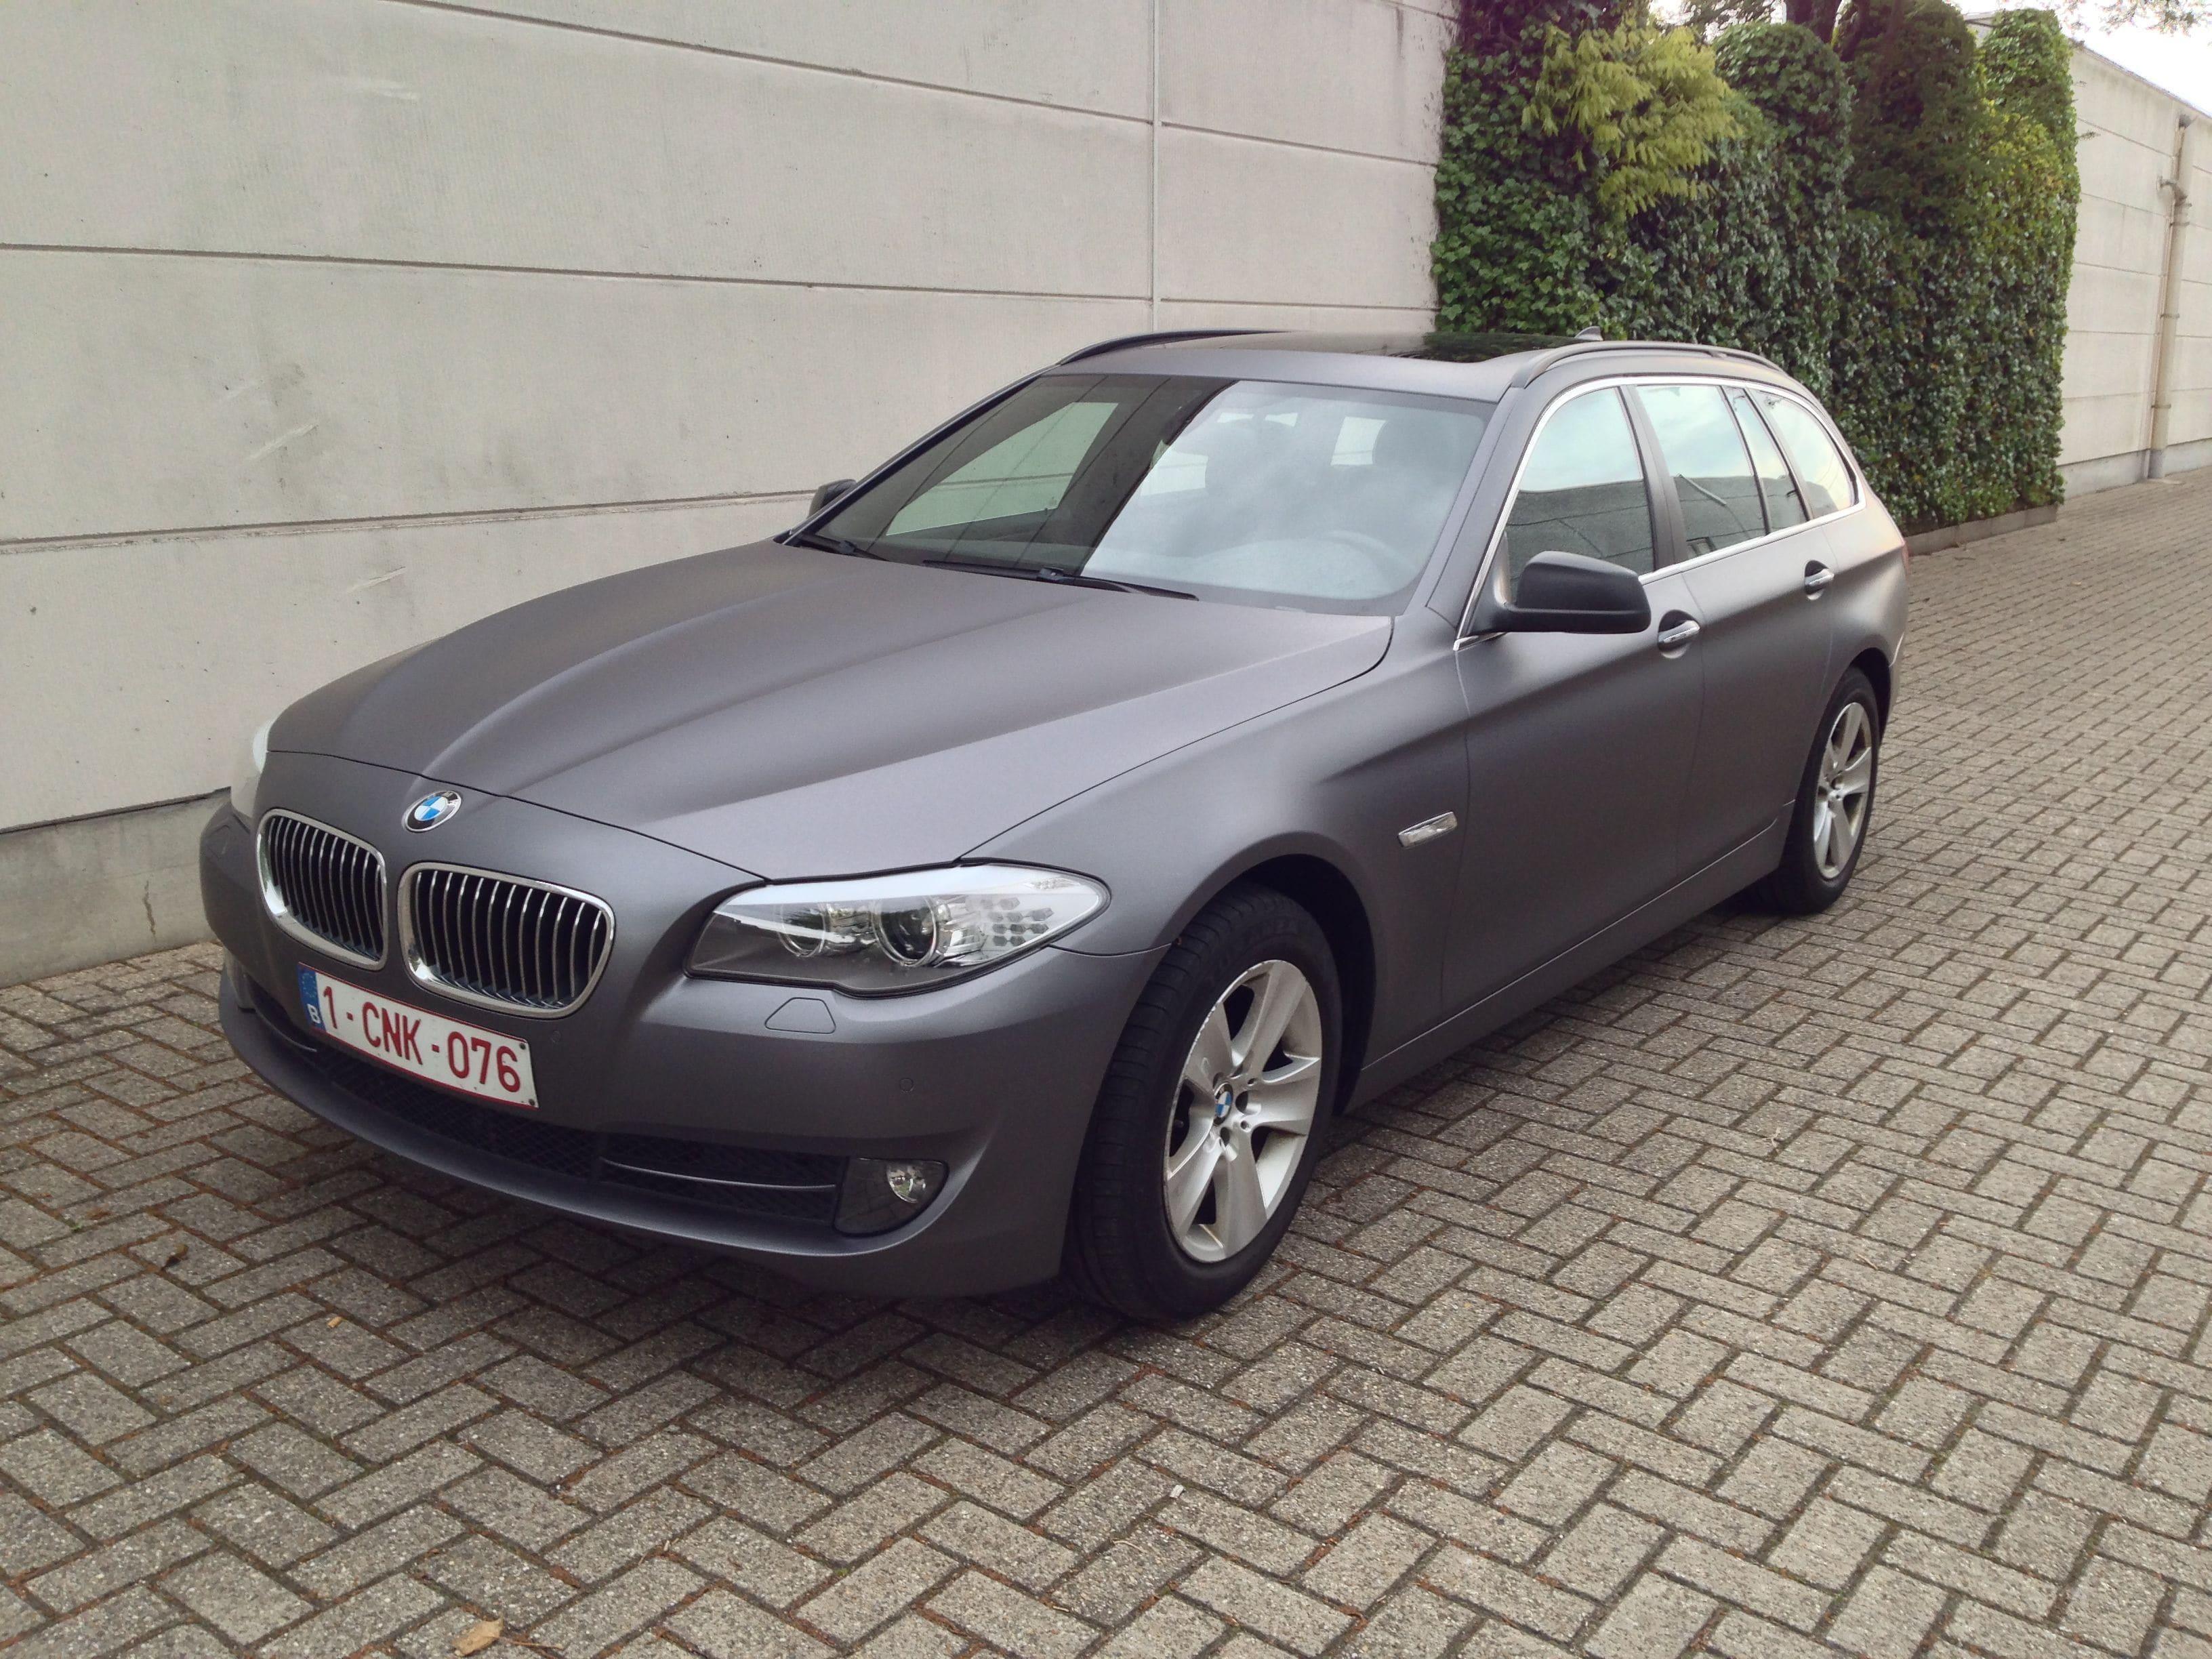 BMW 5 Serie met Gunpowder Wrap, Carwrapping door Wrapmyride.nu Foto-nr:5264, ©2021